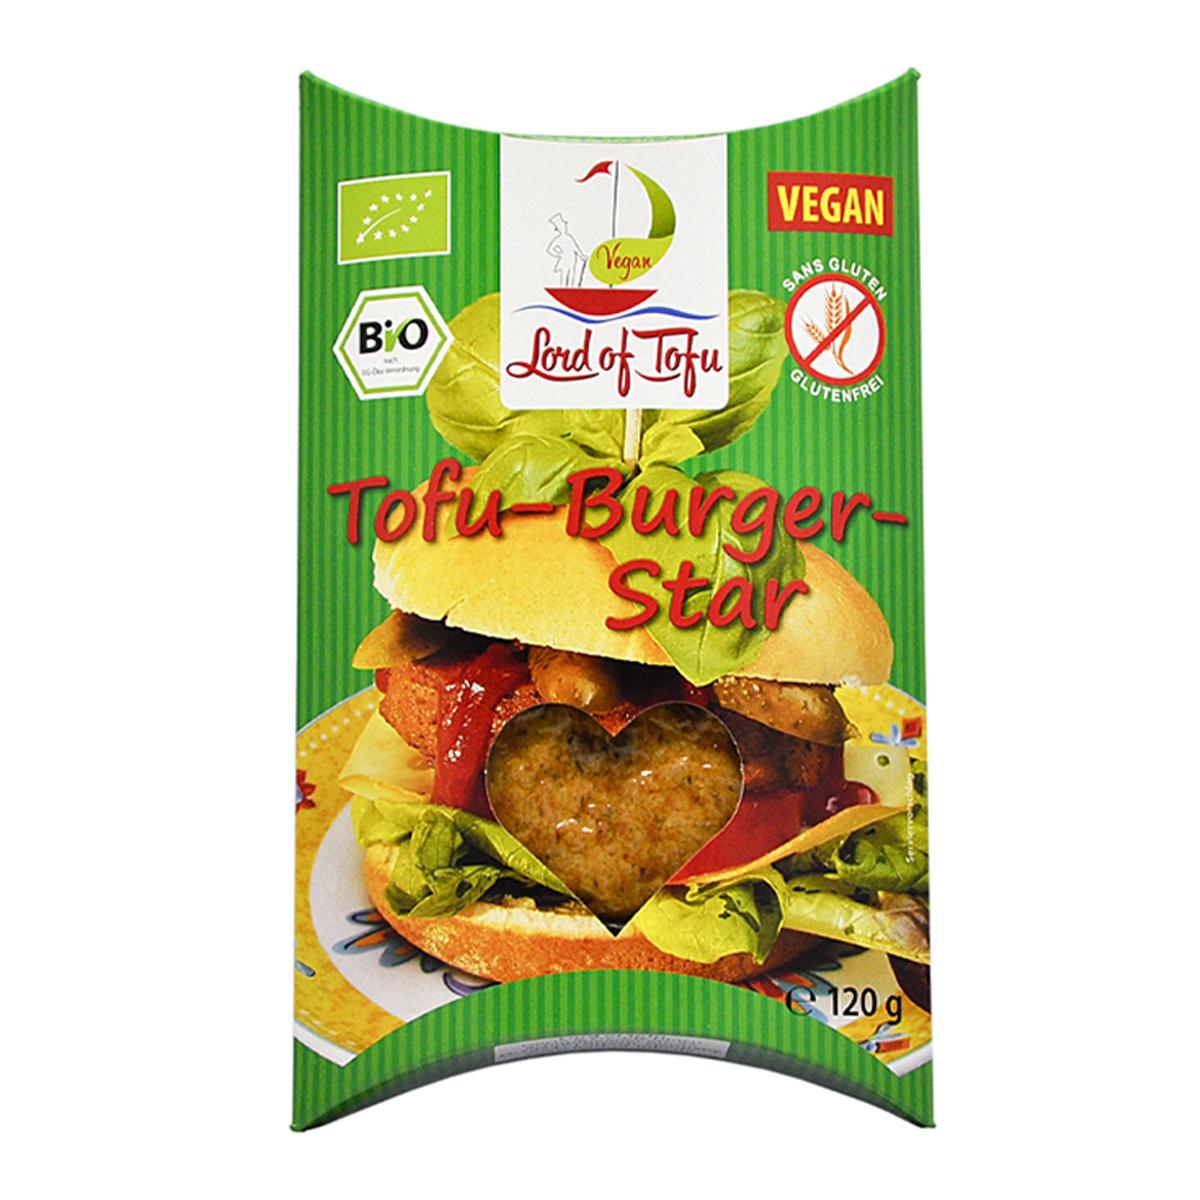 Lord of Tofu - Steak hâché pour burger au tofu 120g